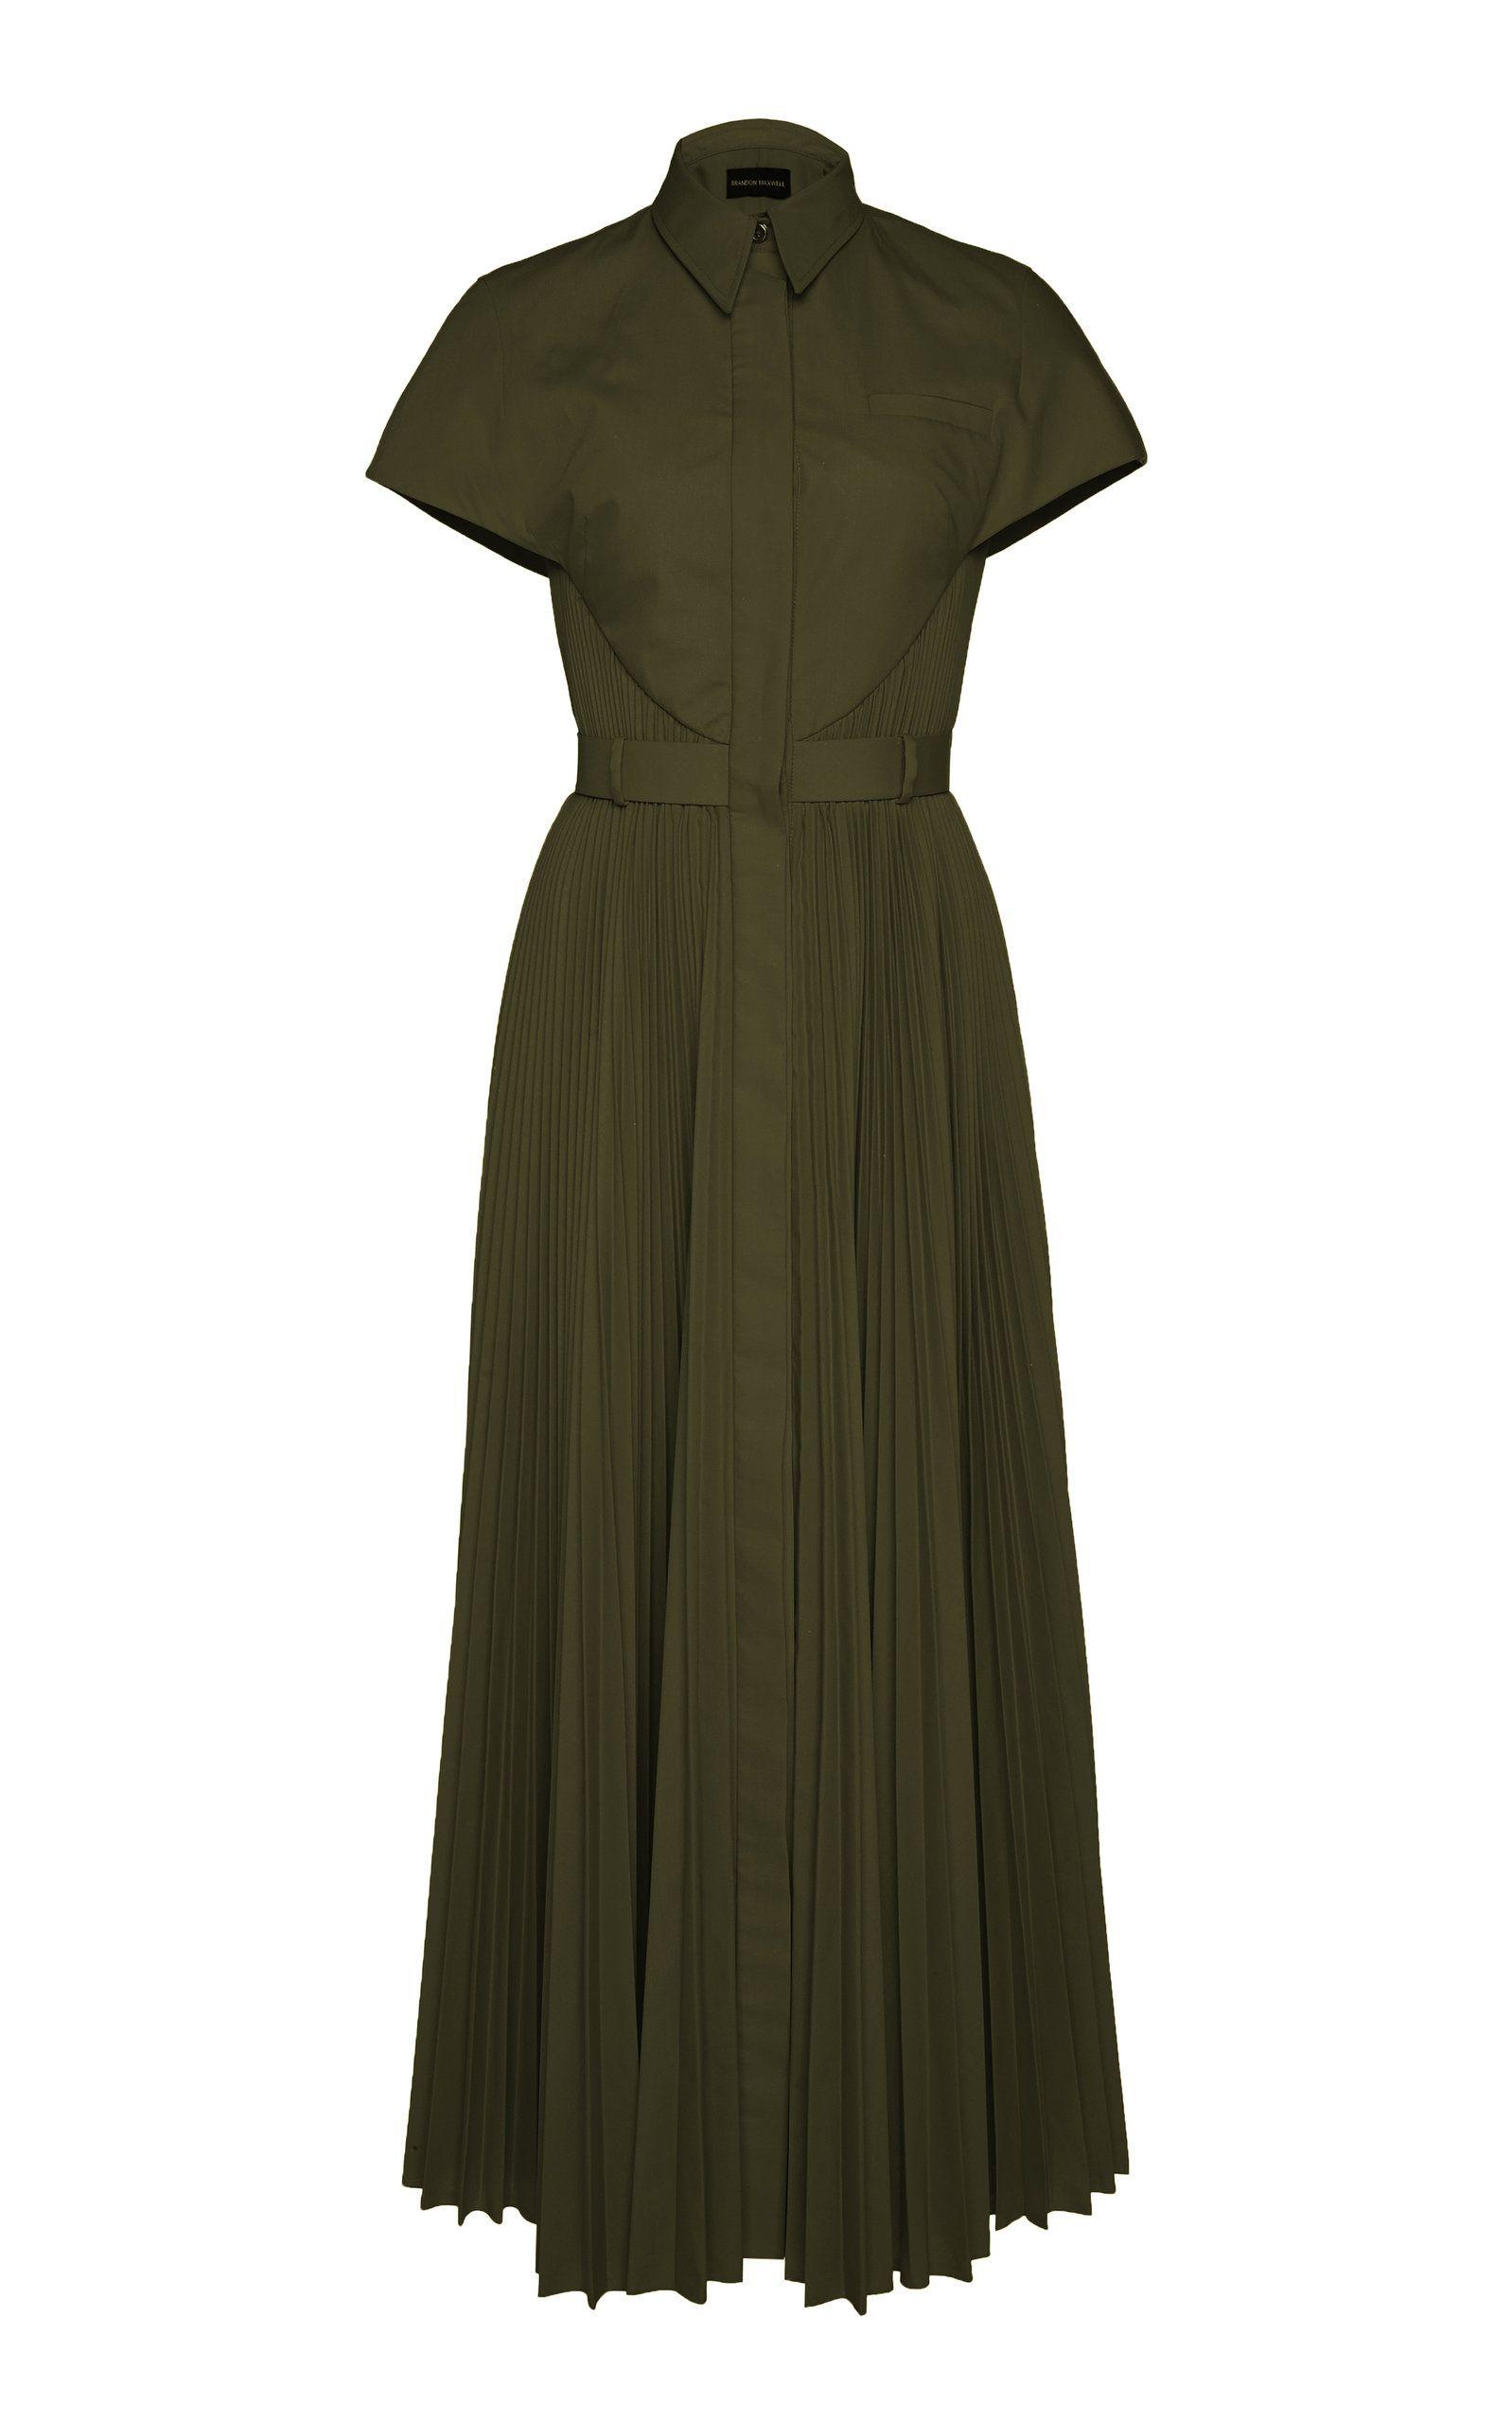 fa03b7ed3b127 Alexachung Point-collar satin midi dress ($515) ❤ liked on Polyvore  featuring dresses, gowns, alexa chung, mid calf dresses, calf …